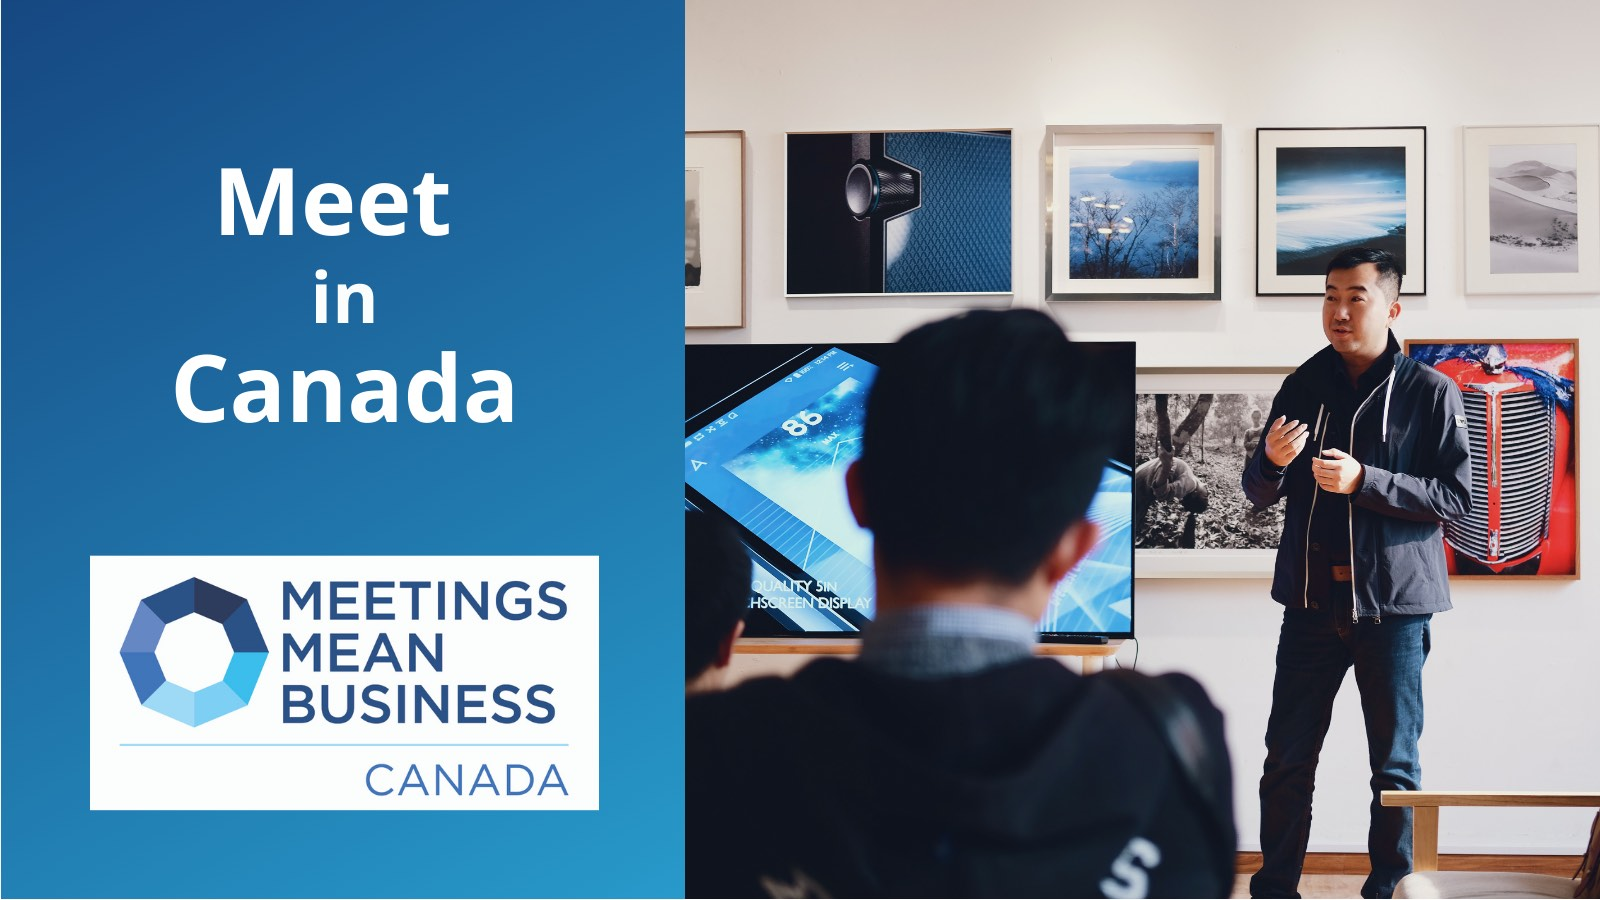 Meet in Canada, Business people meeting